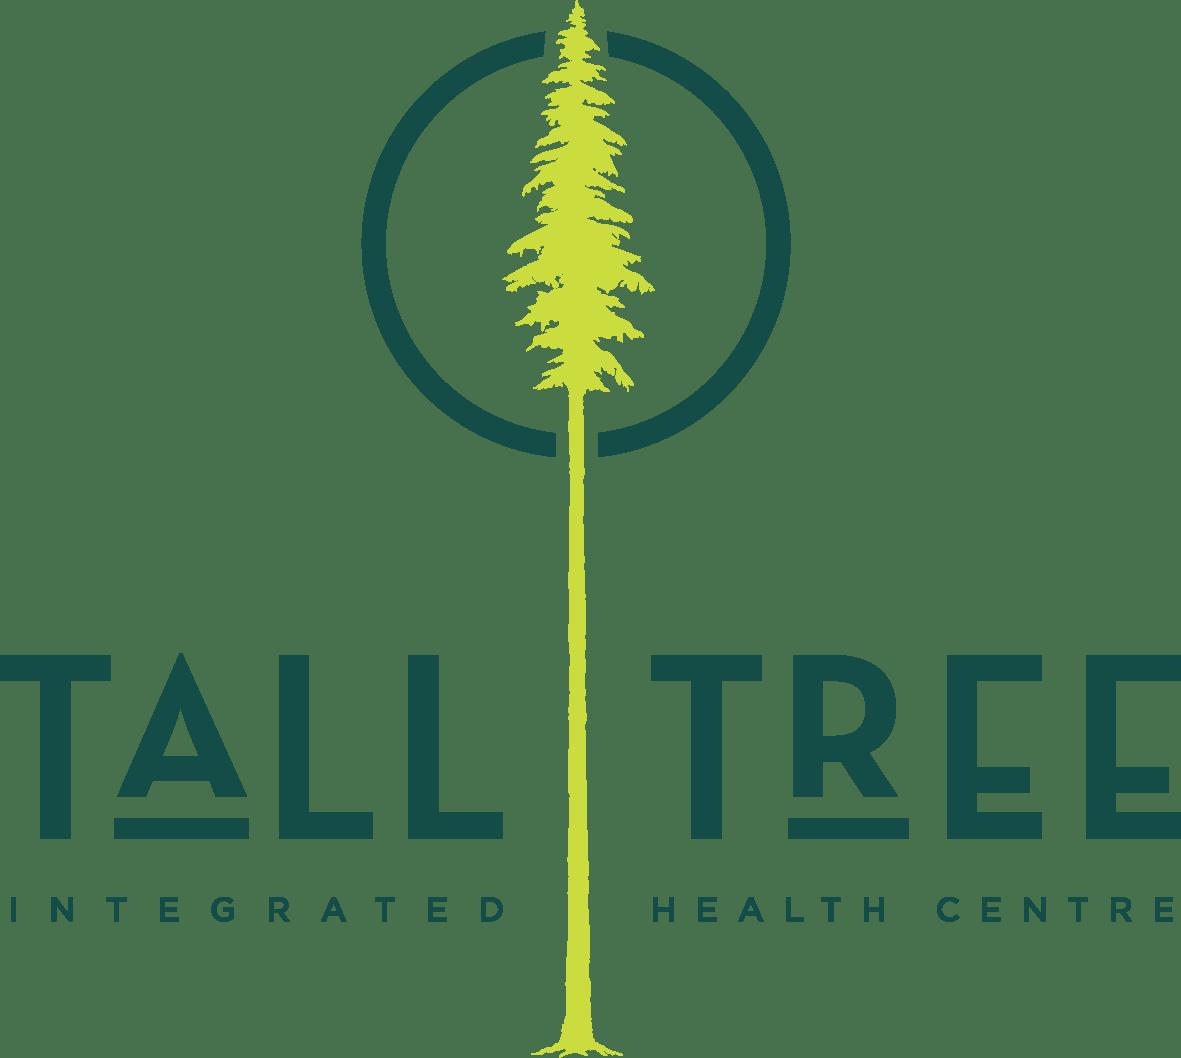 Tall Tree Integrated Health